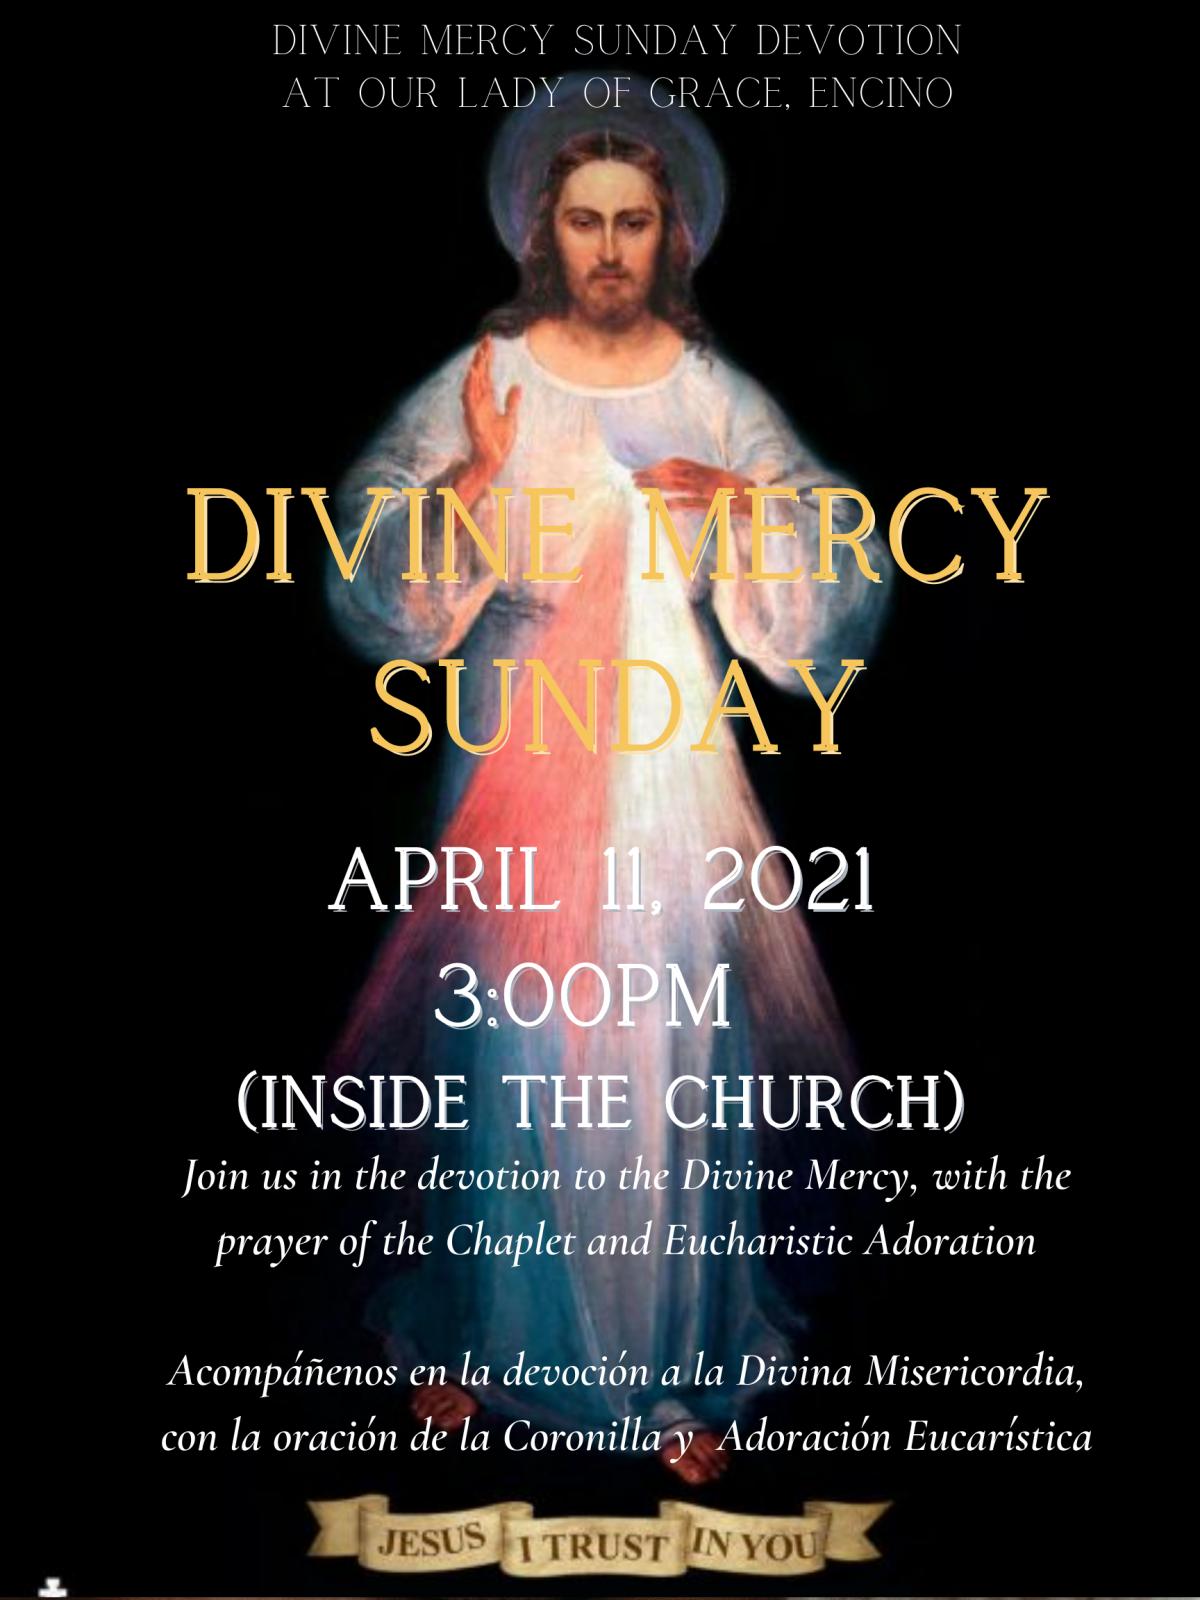 Divine Mercy Sunday Devotion